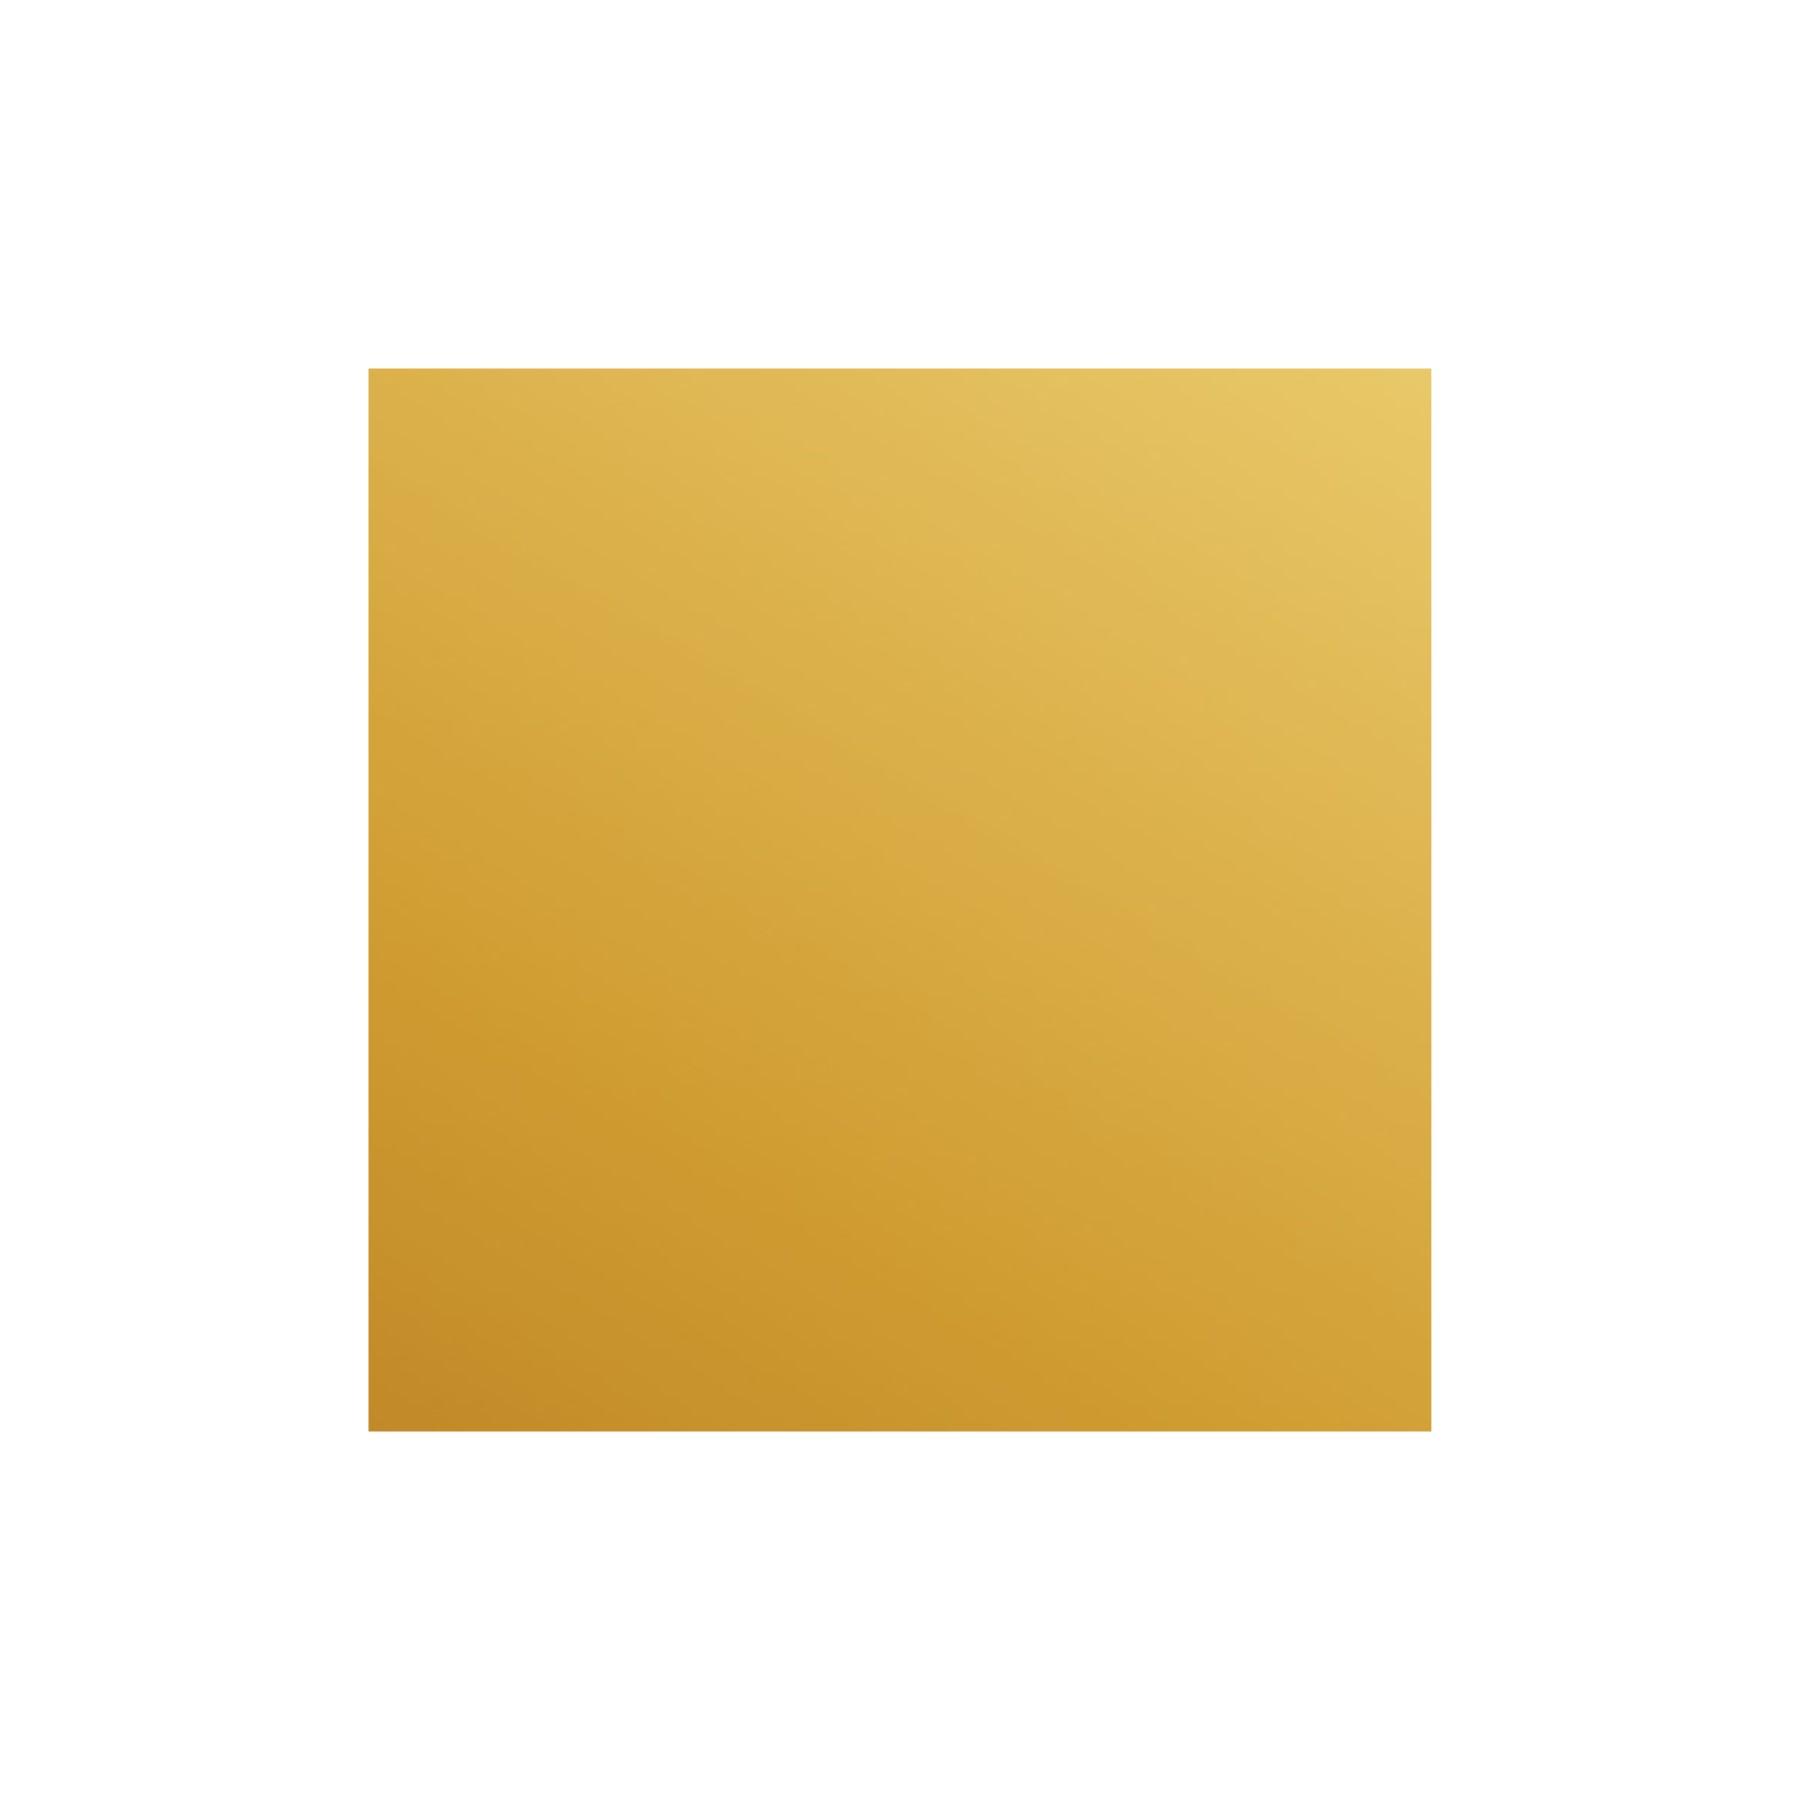 Vinilo textil Easyweed® Electric hoja 30 x 38 cm Amarillo